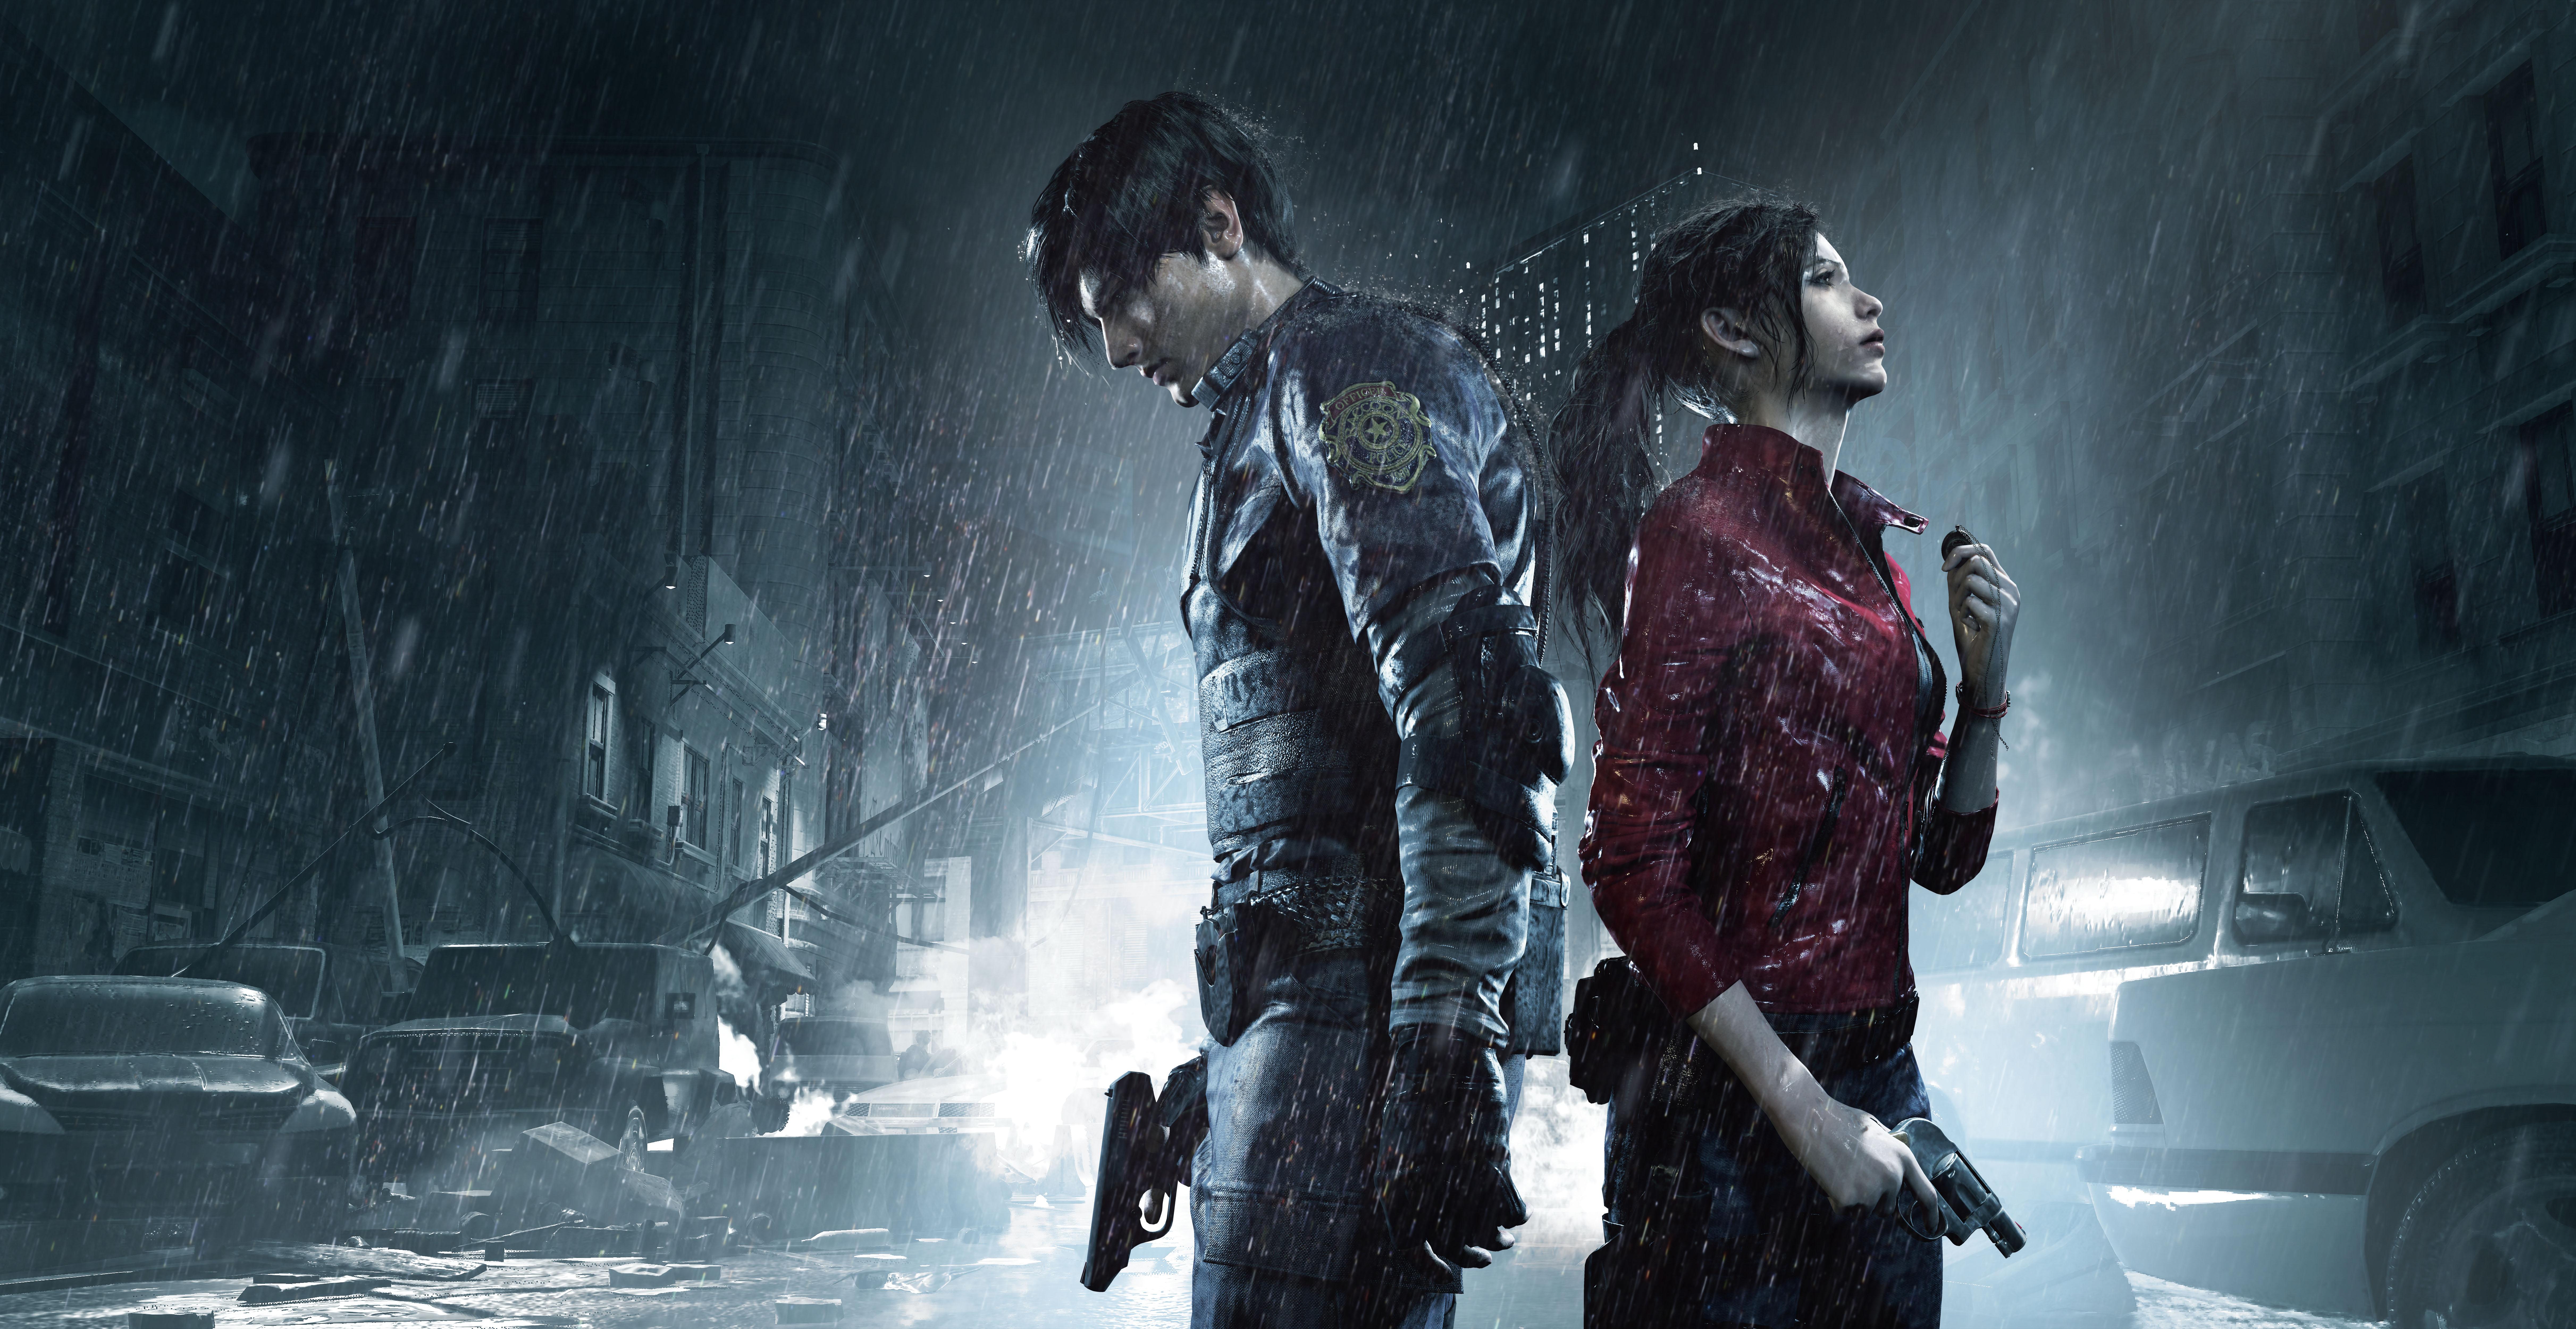 Леон и Клэр - Resident Evil 2 10K, Арт